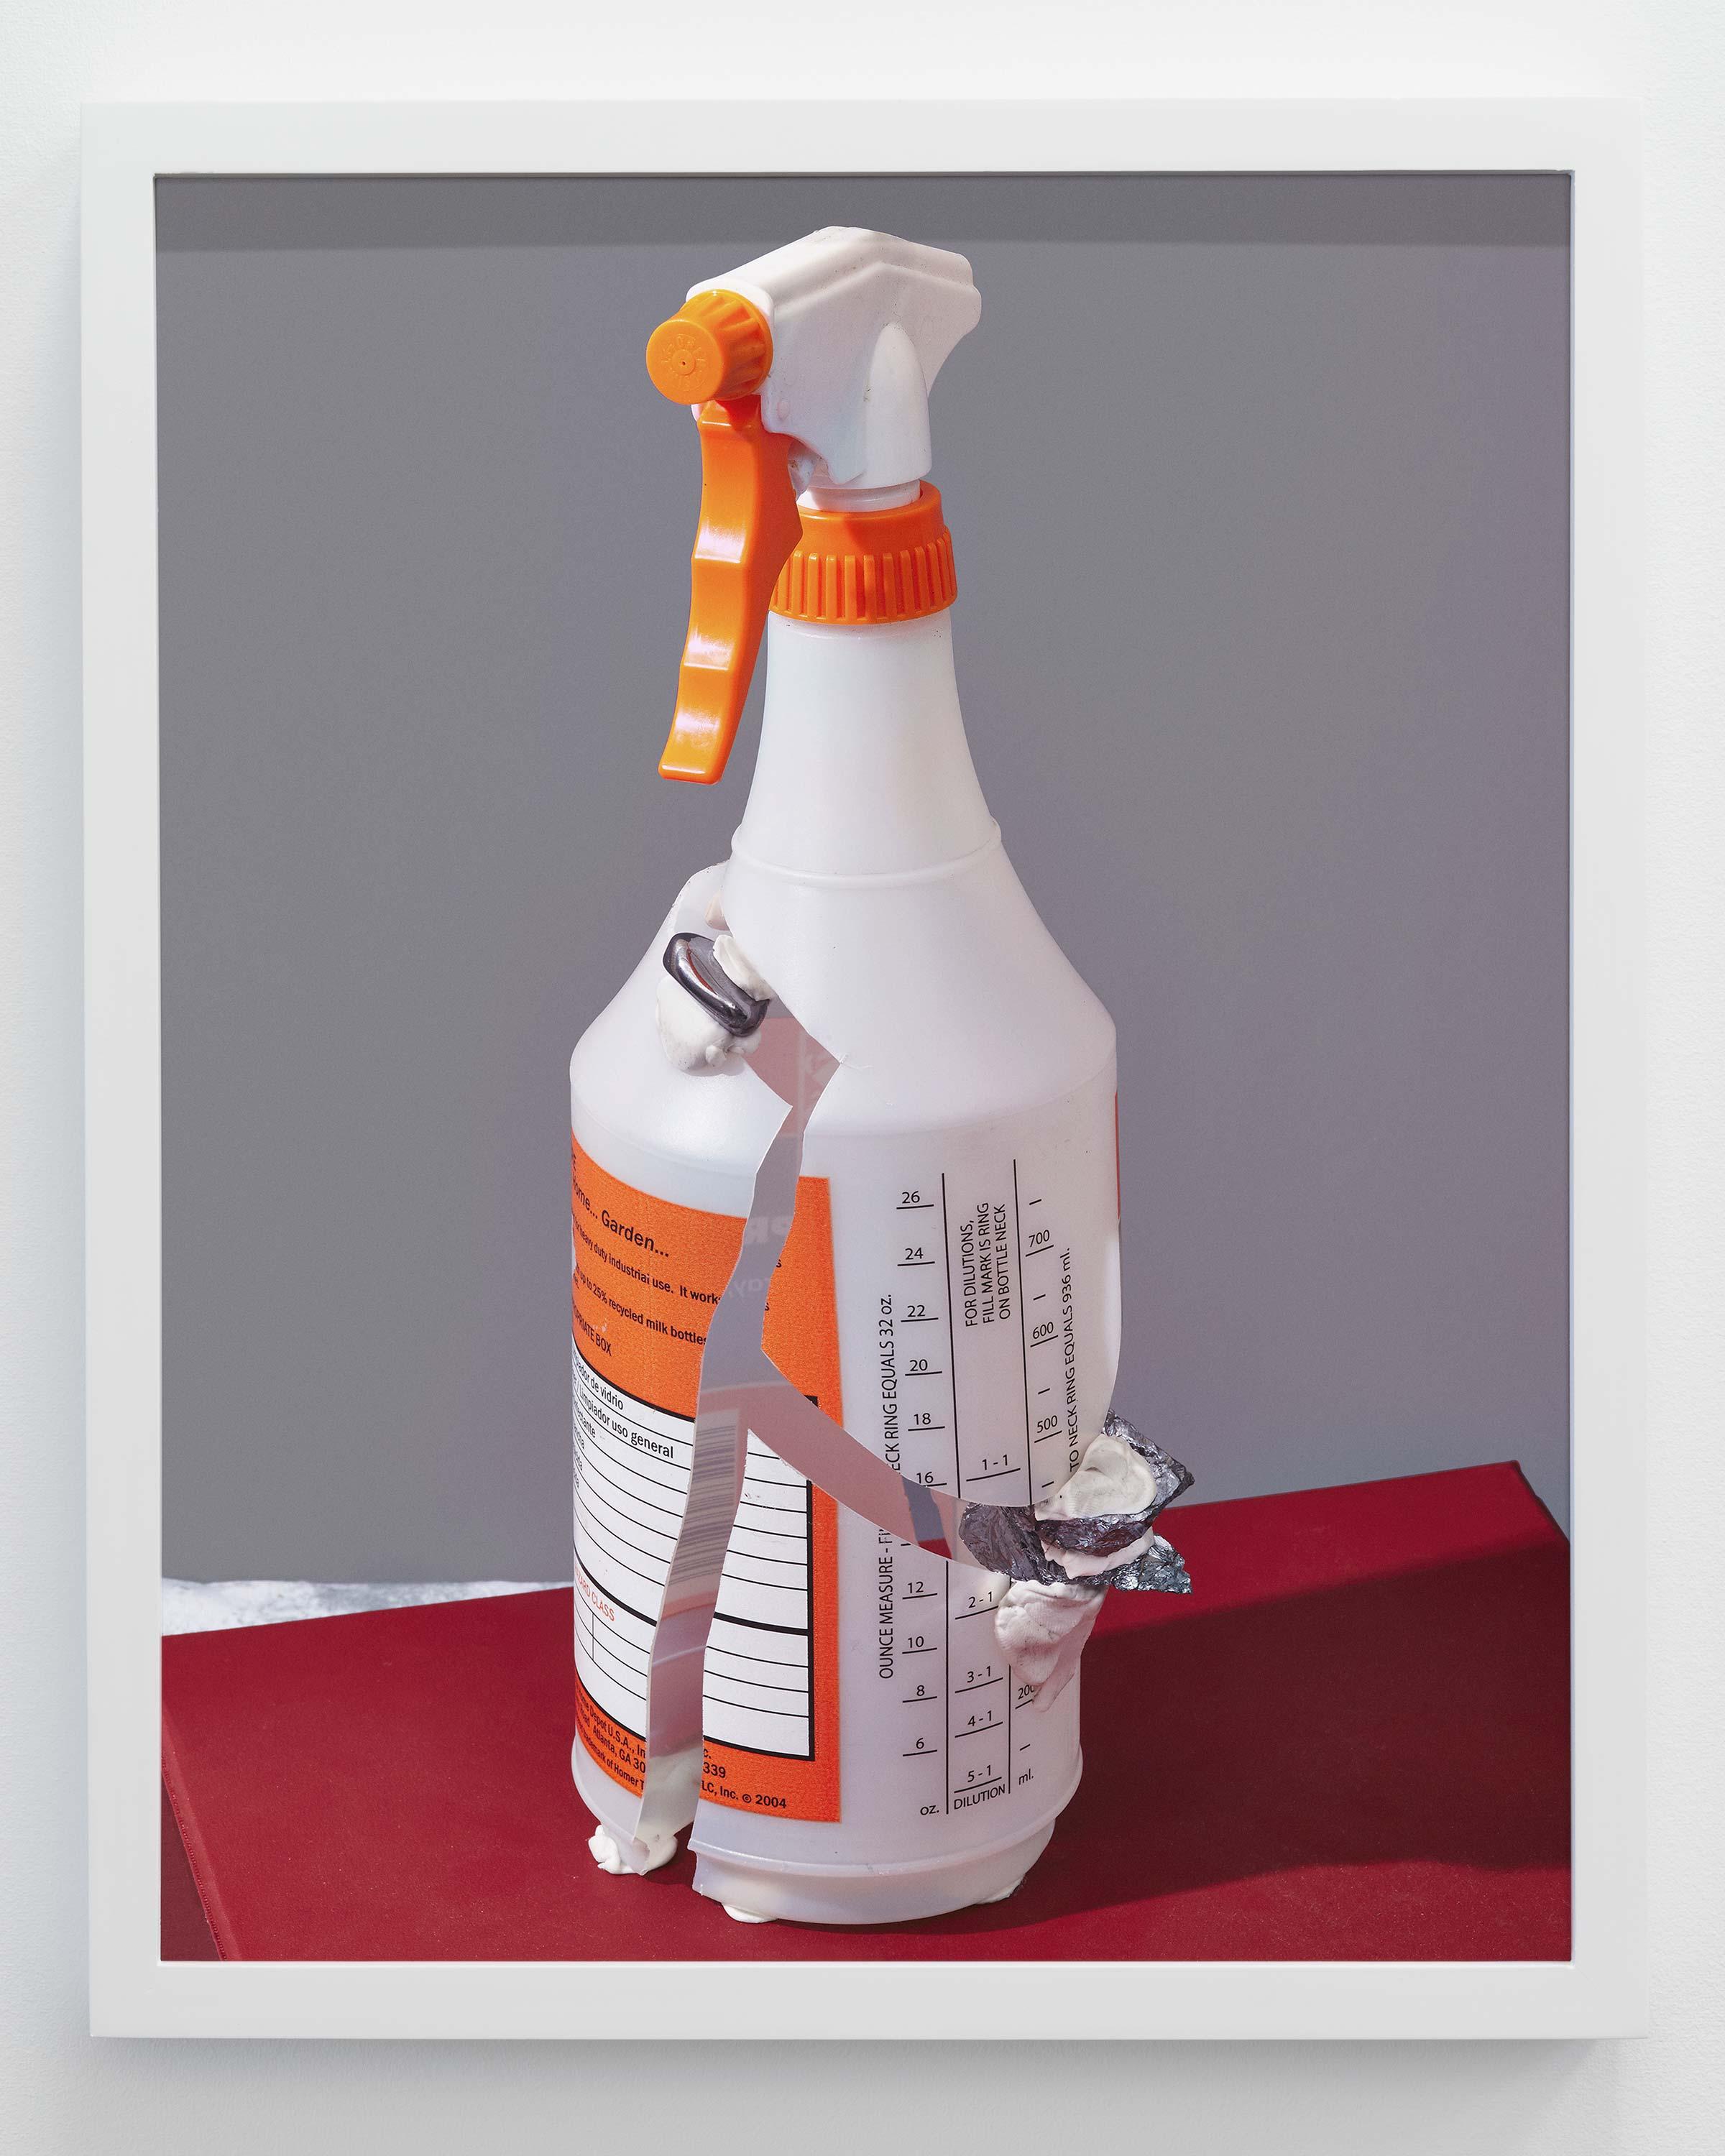 Pete Deevakul<br>Bottle (ฃ. ขวด)<br>2015<br>Archival inkjet print<br>16 x 20 inches (40.6 x 50.8 cm)